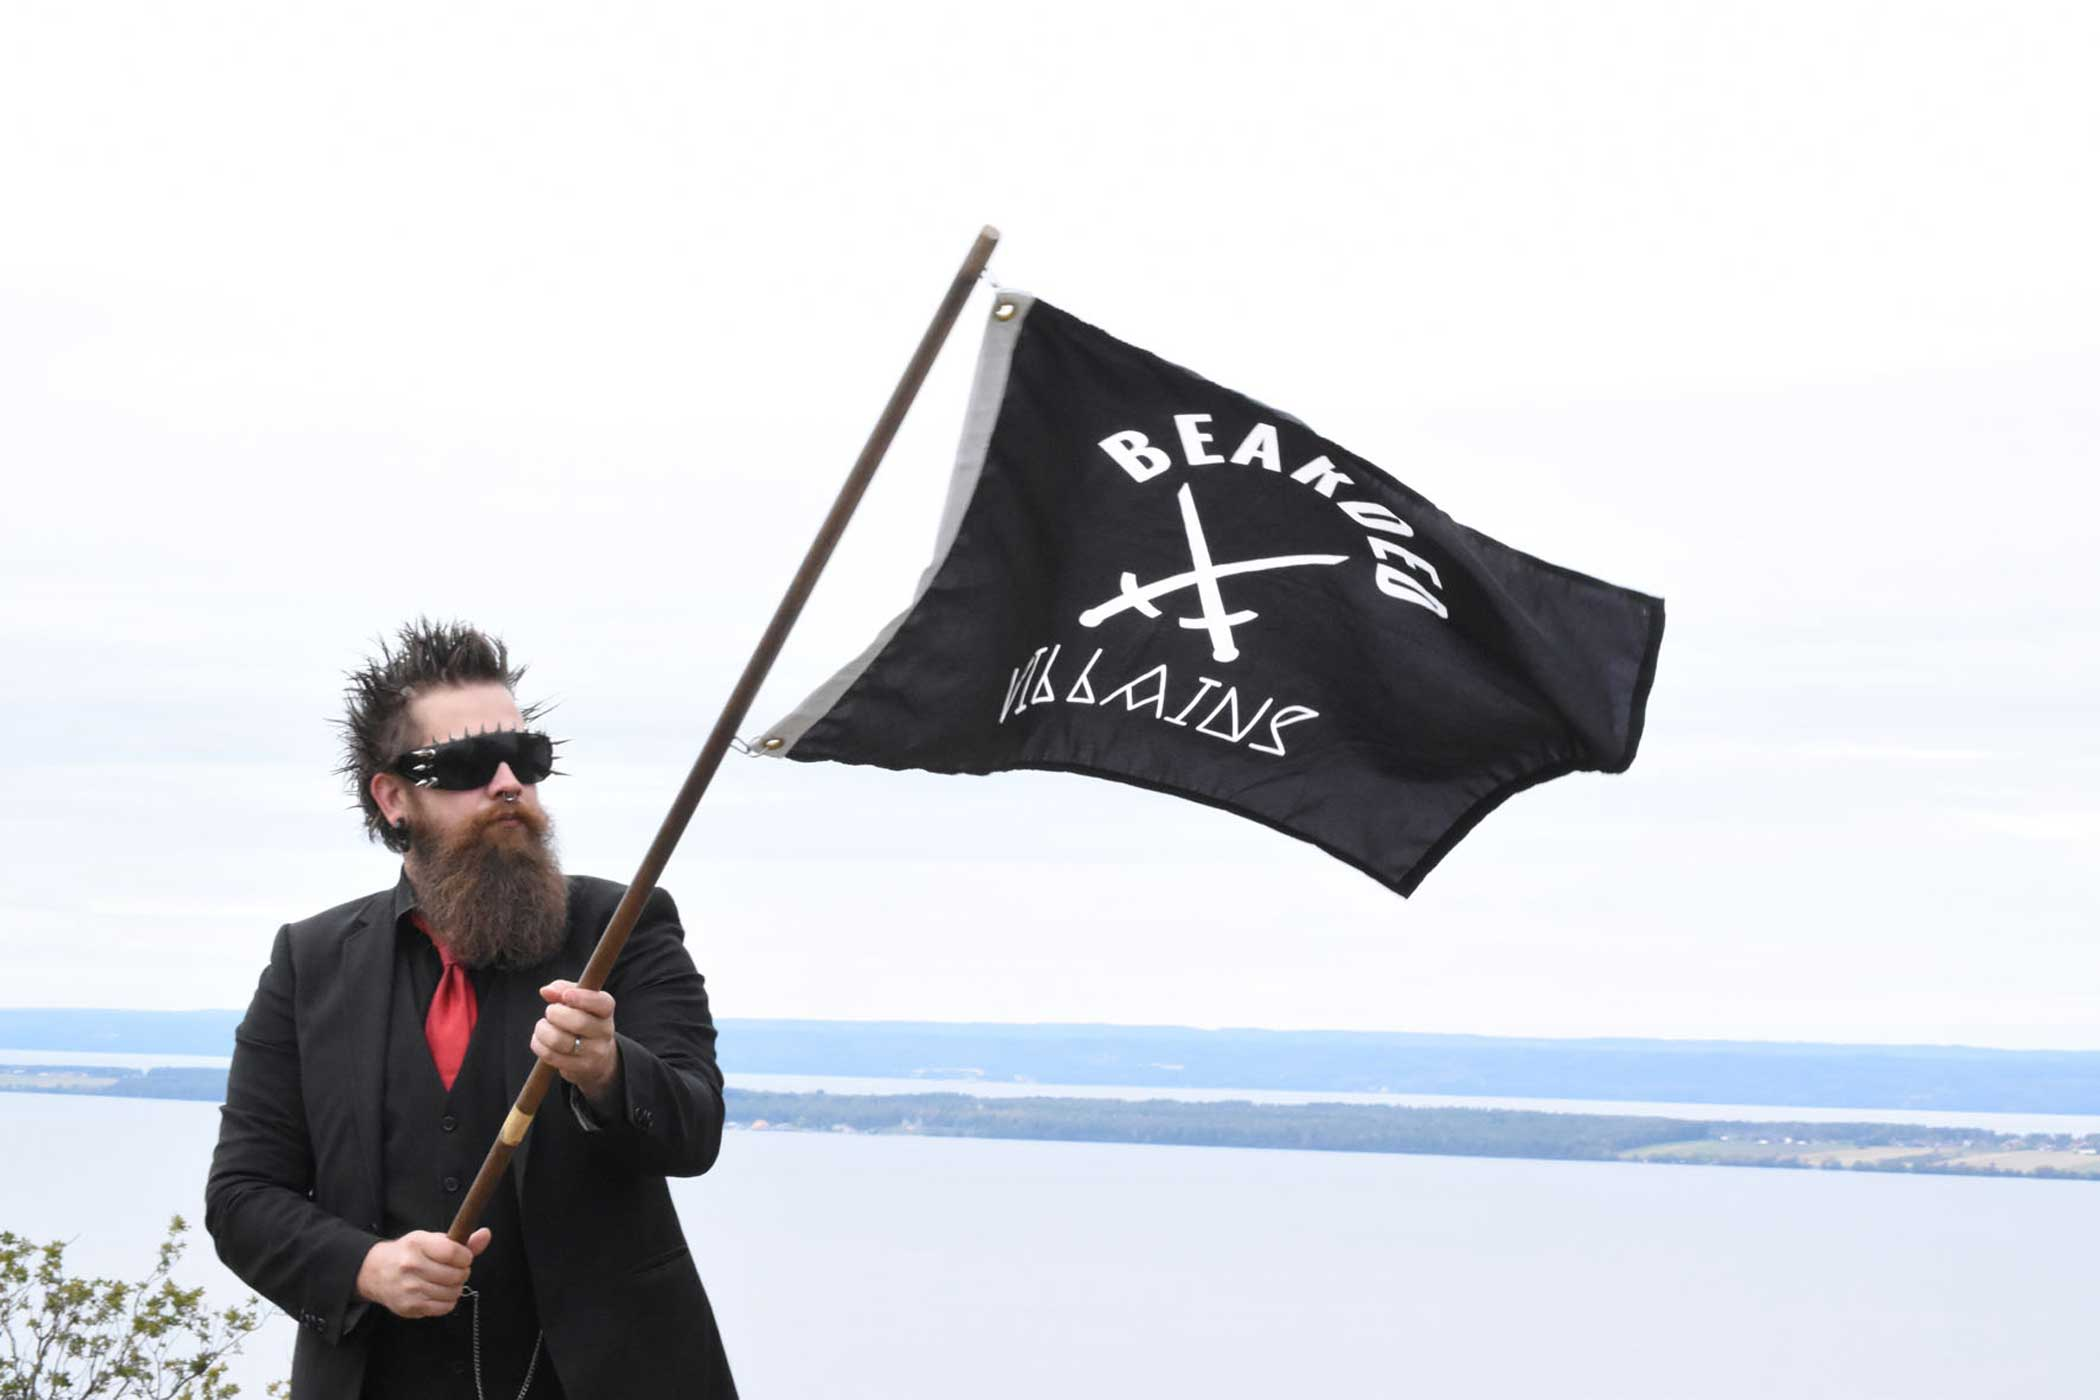 Andreas Fransson waves the Bearded Villains flag.